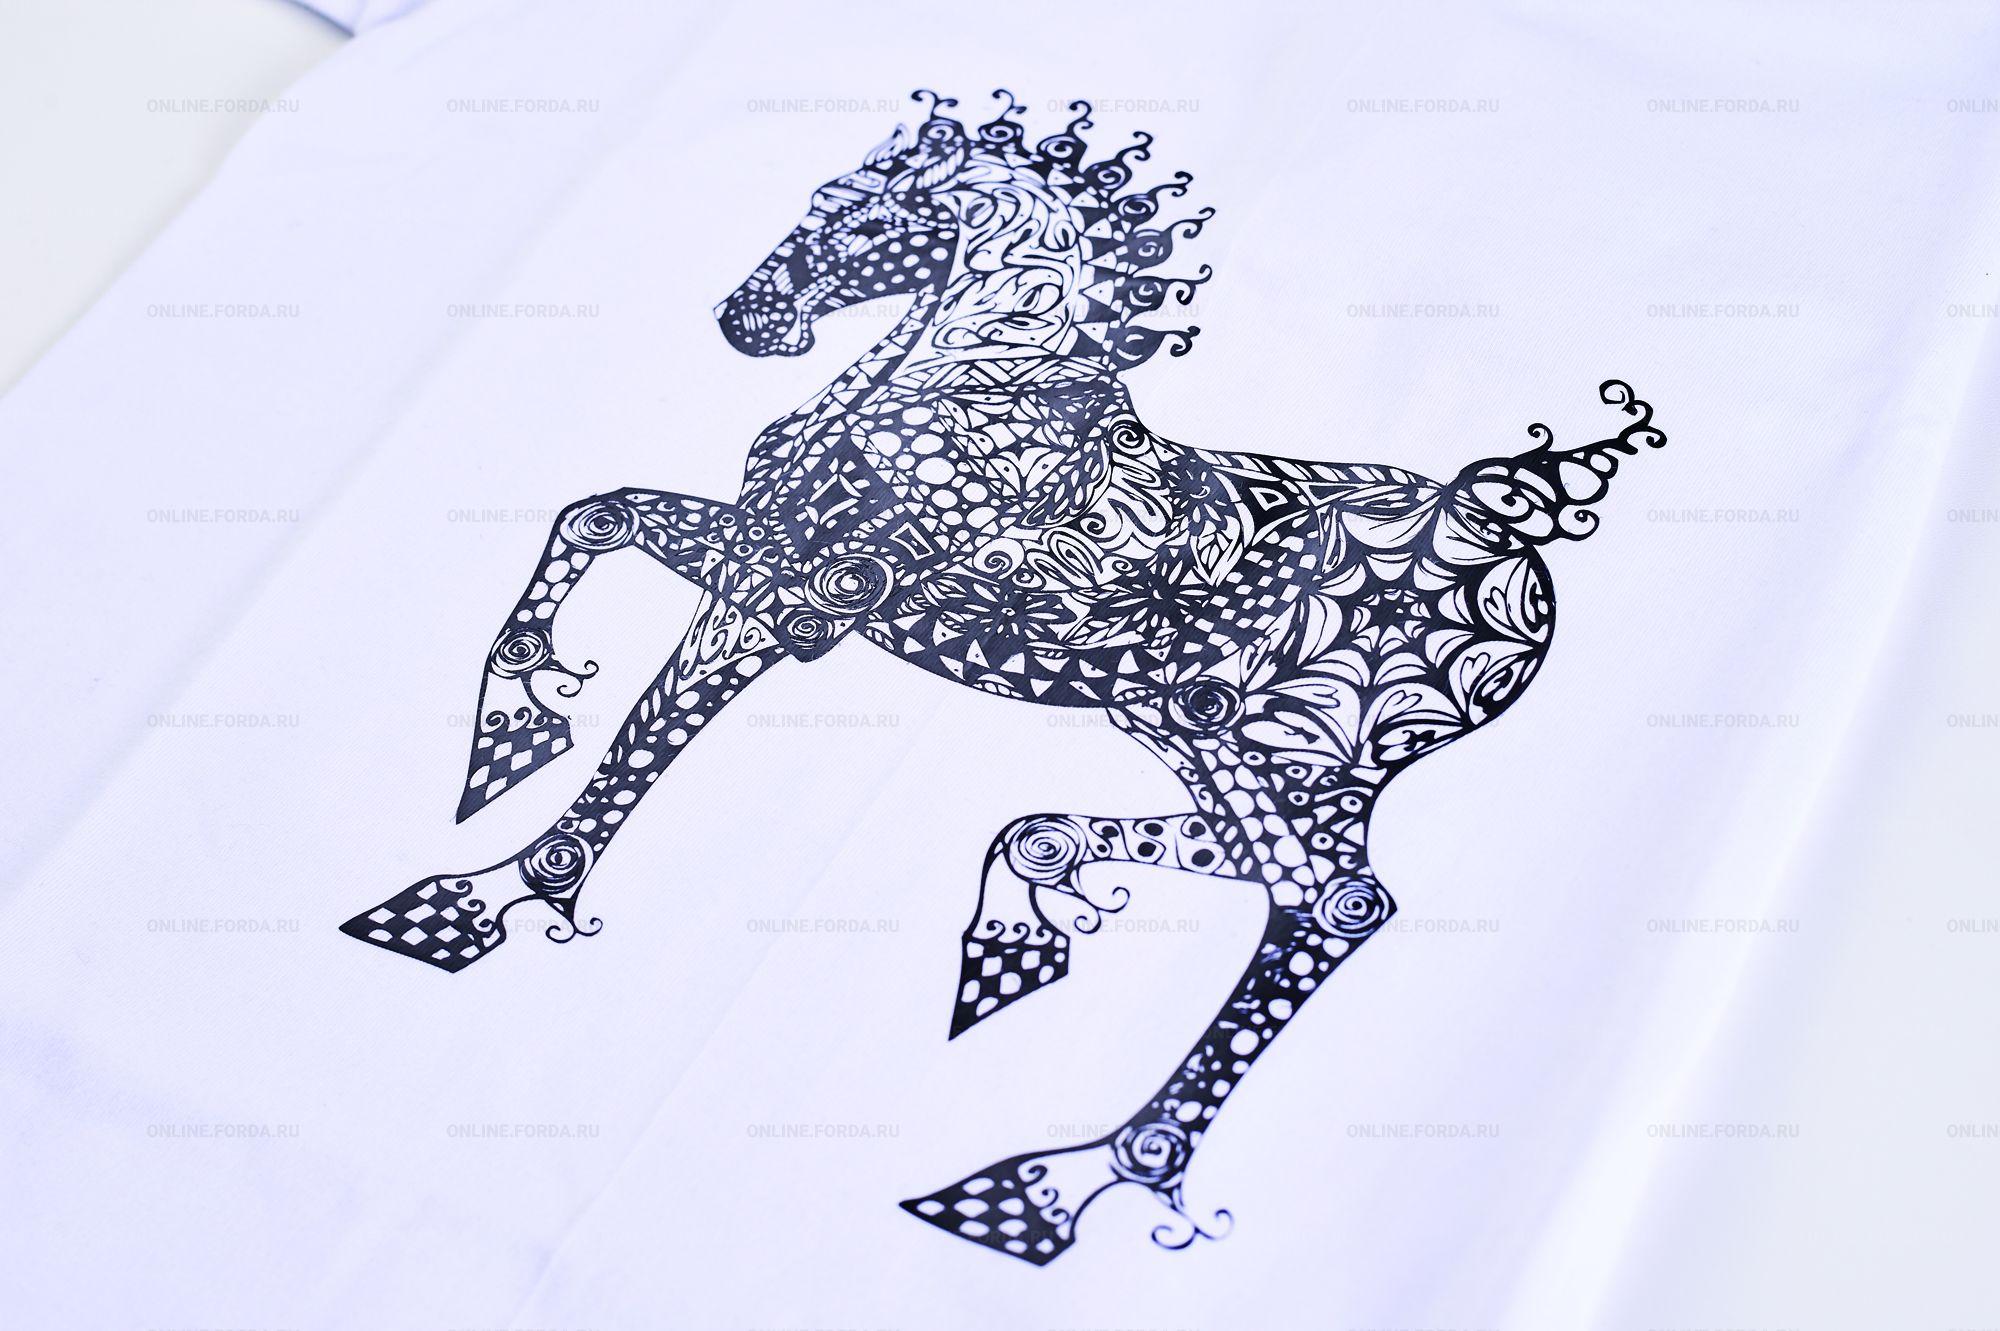 Плёнка для многослойной аппликации на текстиле